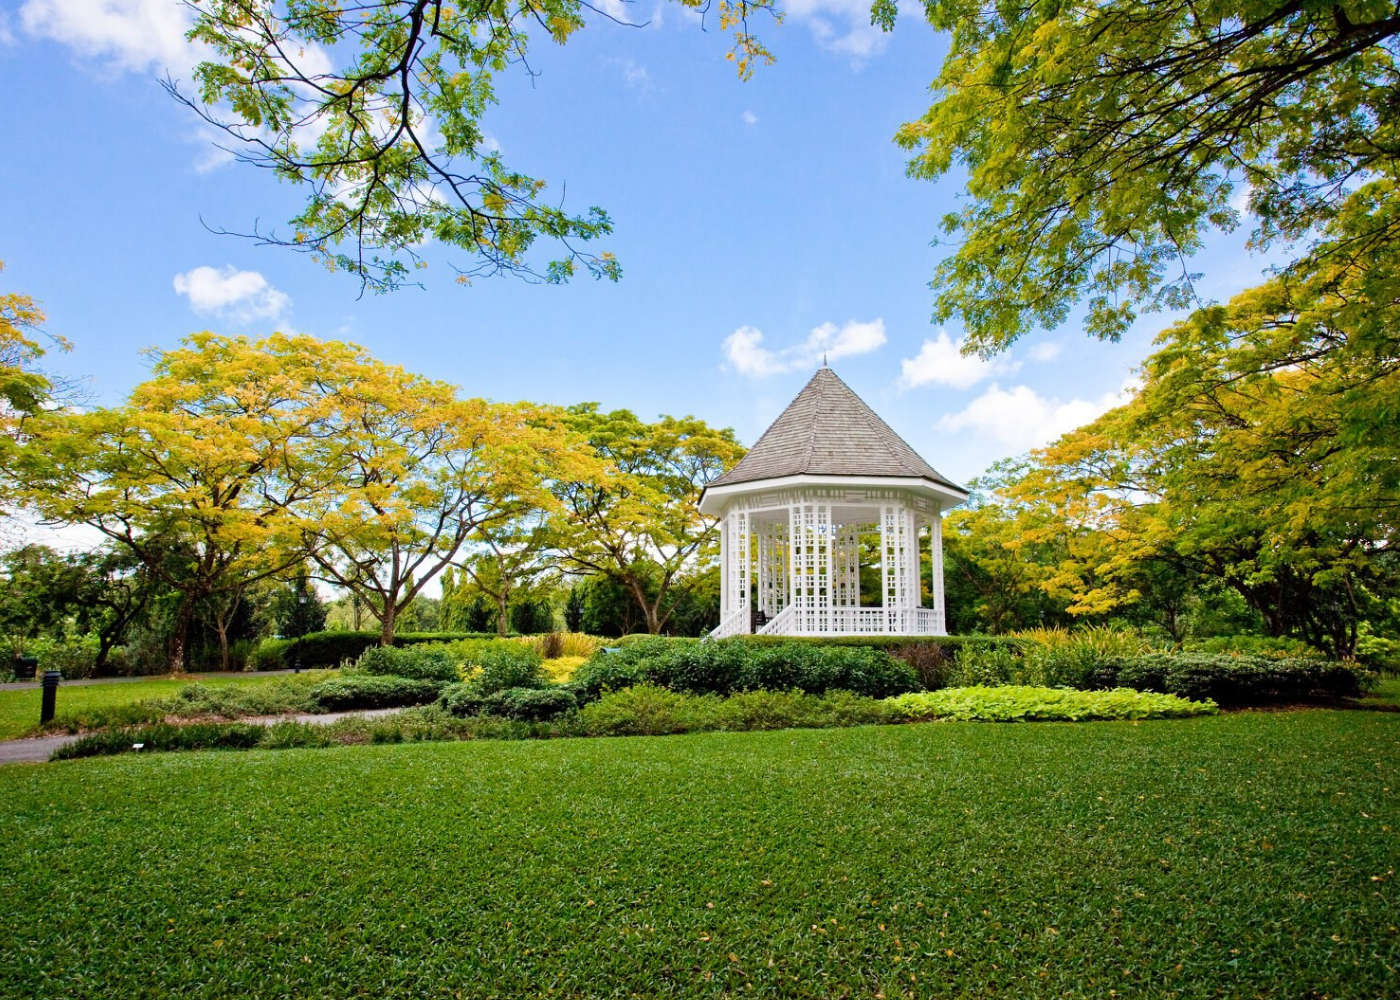 Singapore Botanic Gardens | romantic proposal spots in Singapore